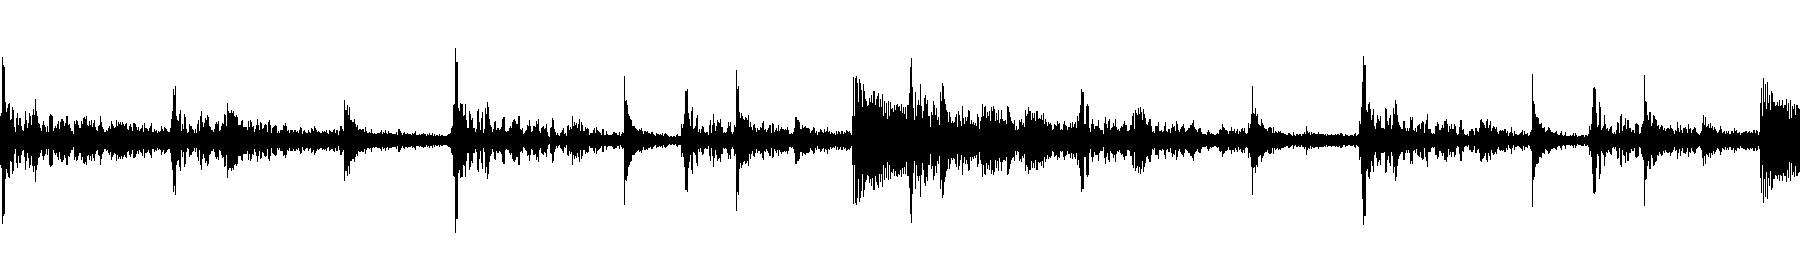 blbc jazzydrums 110 01